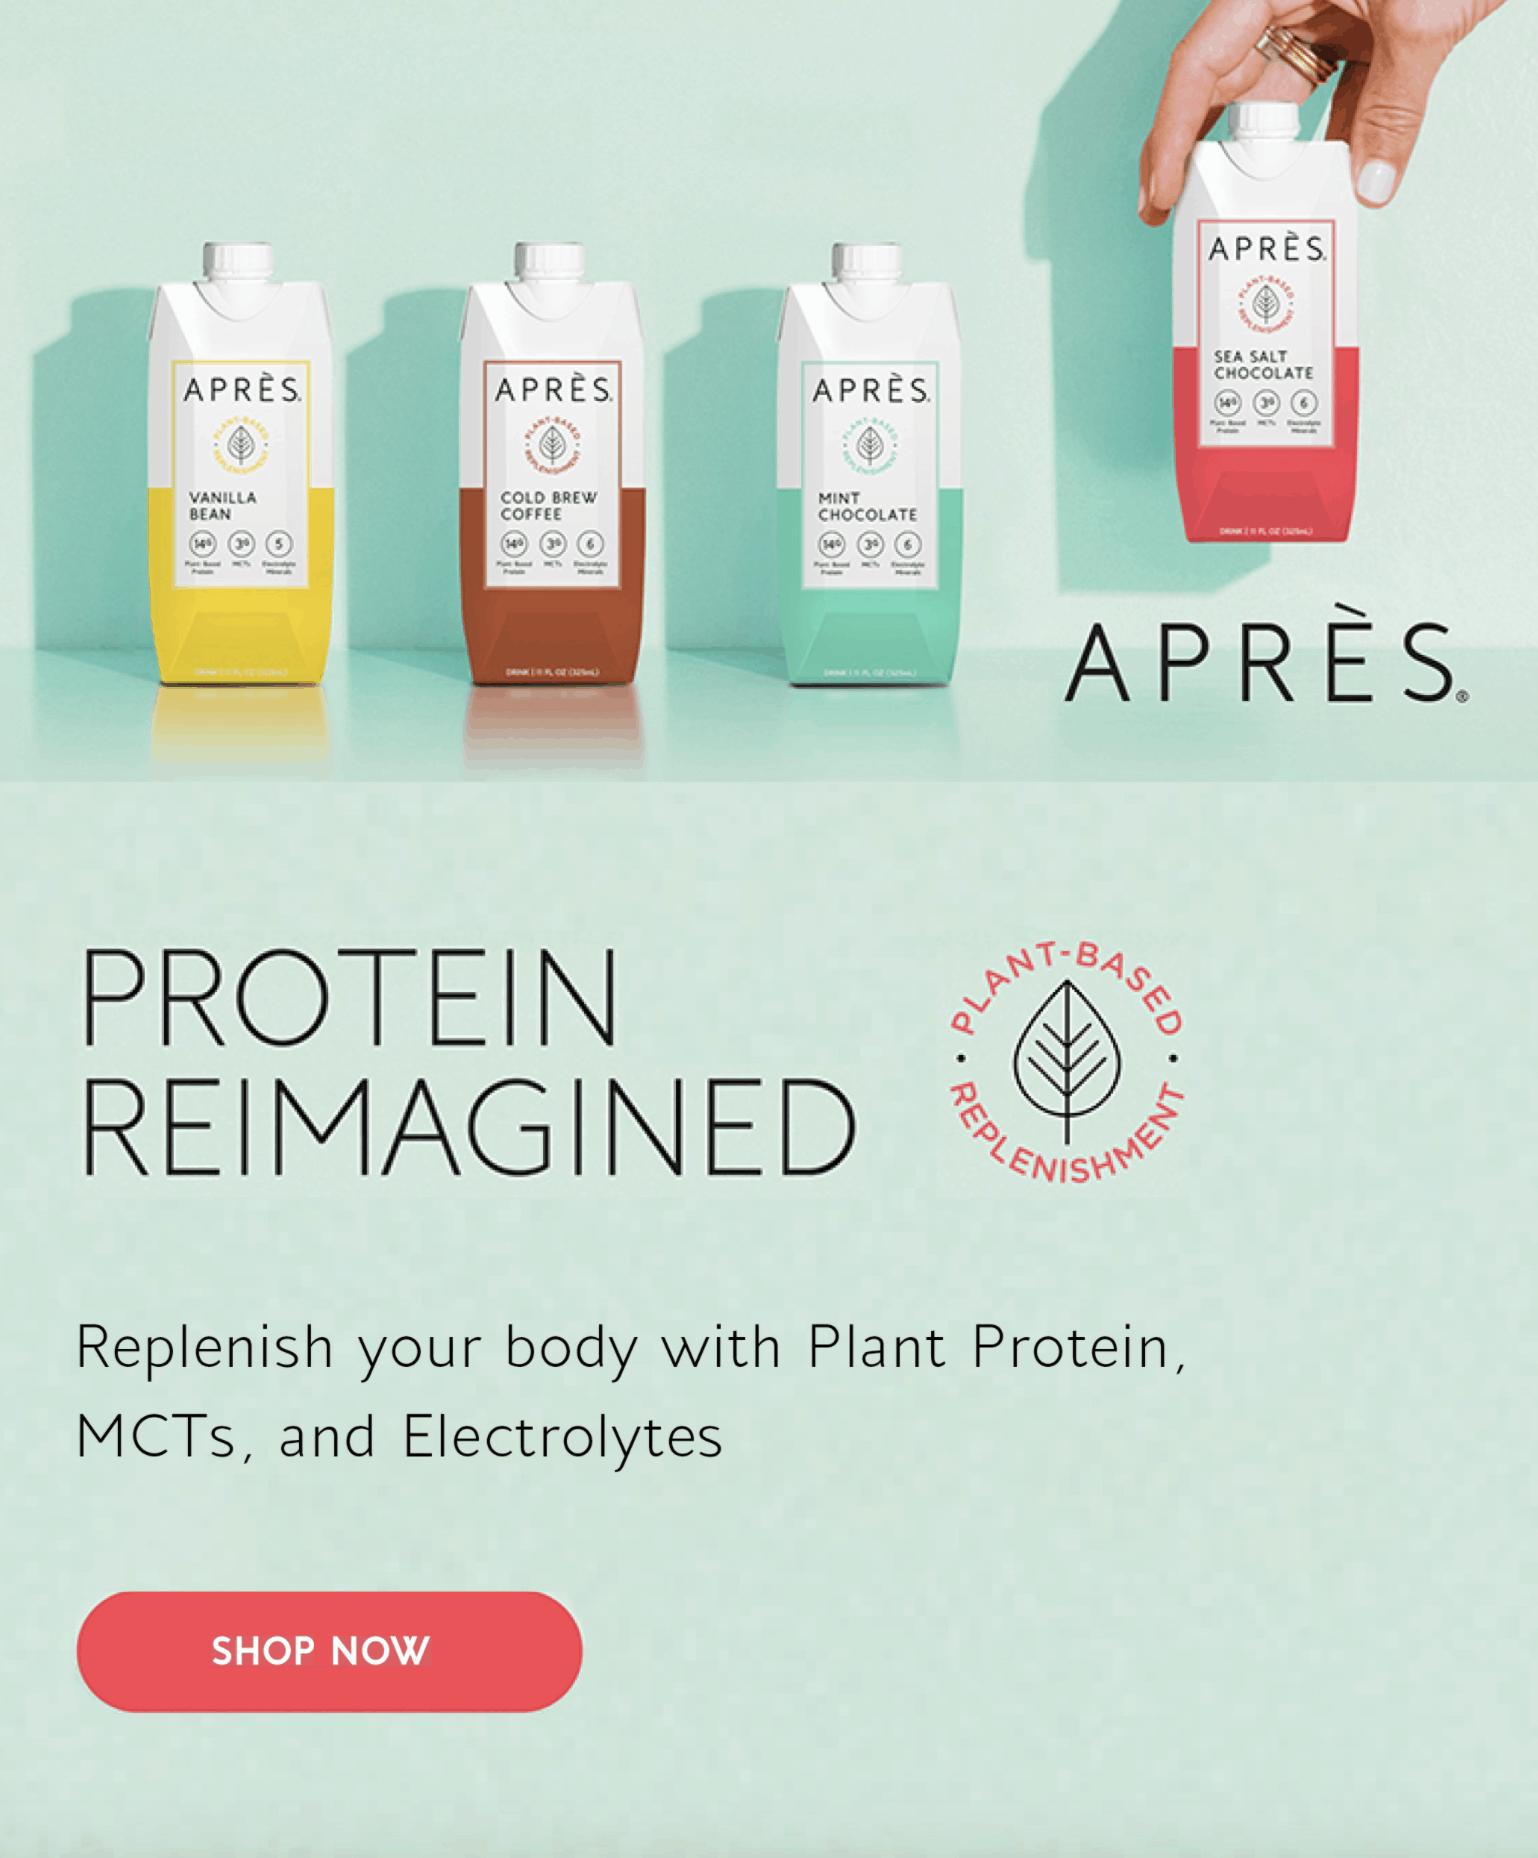 Apres plant protein